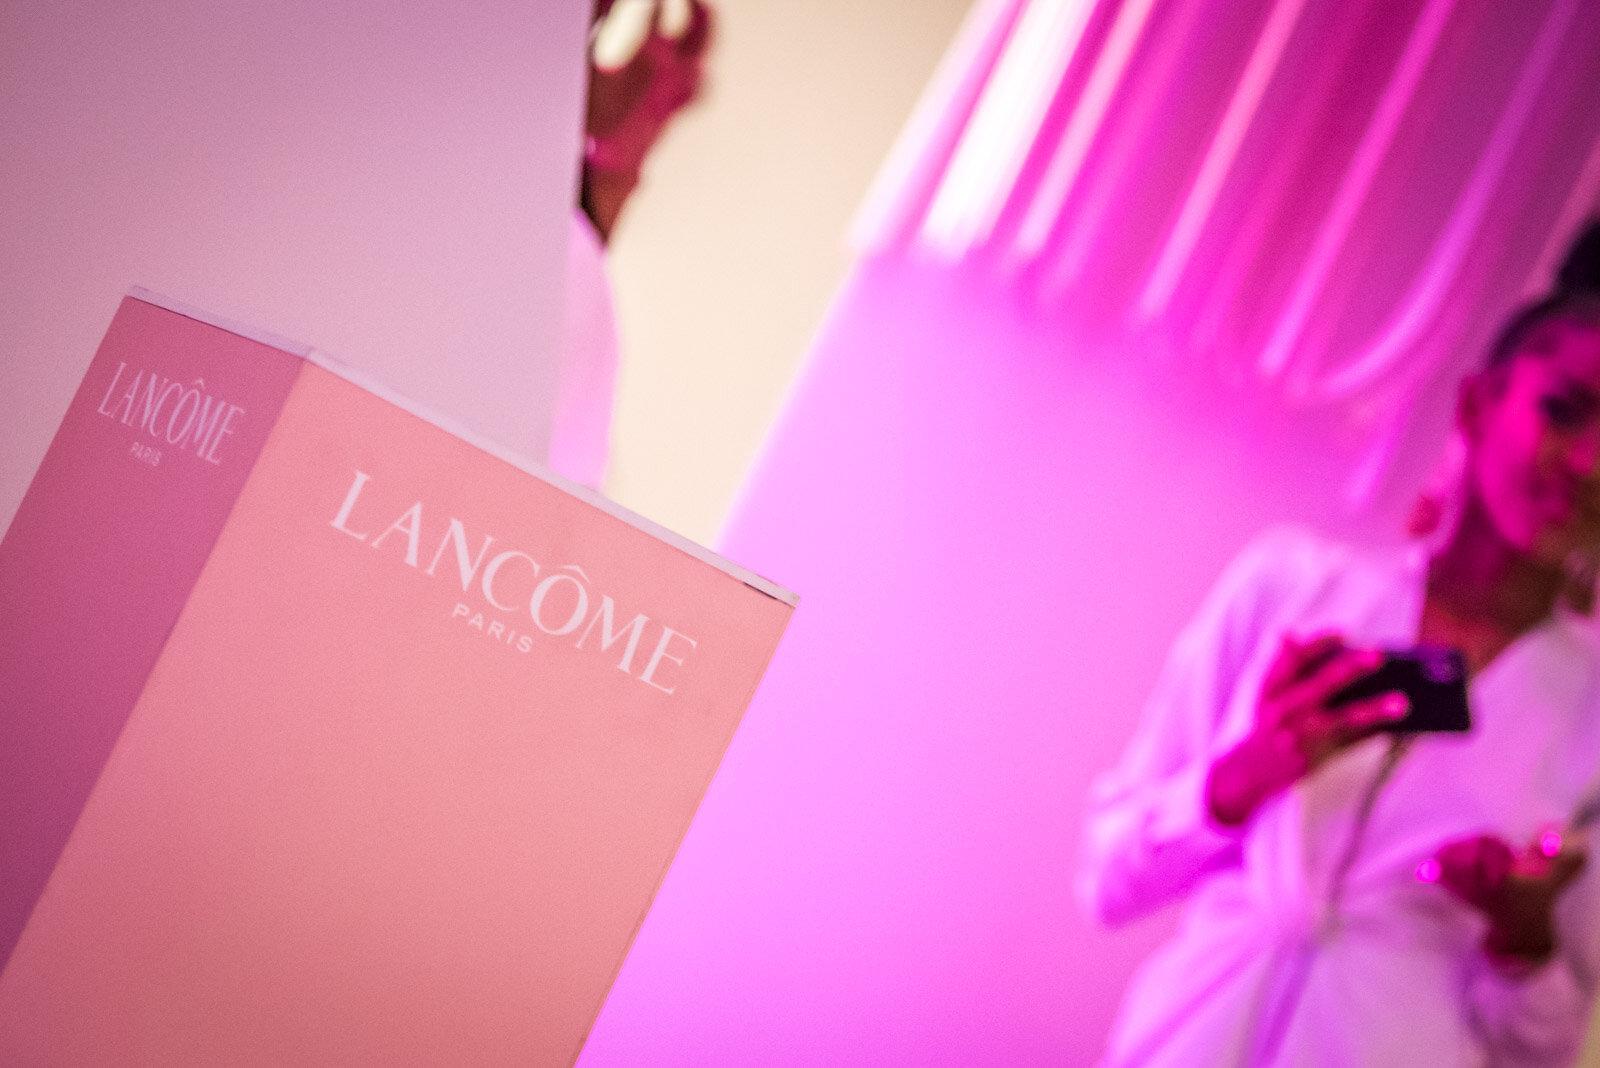 Lancome_Idol_Launch_Cayman-7.jpg